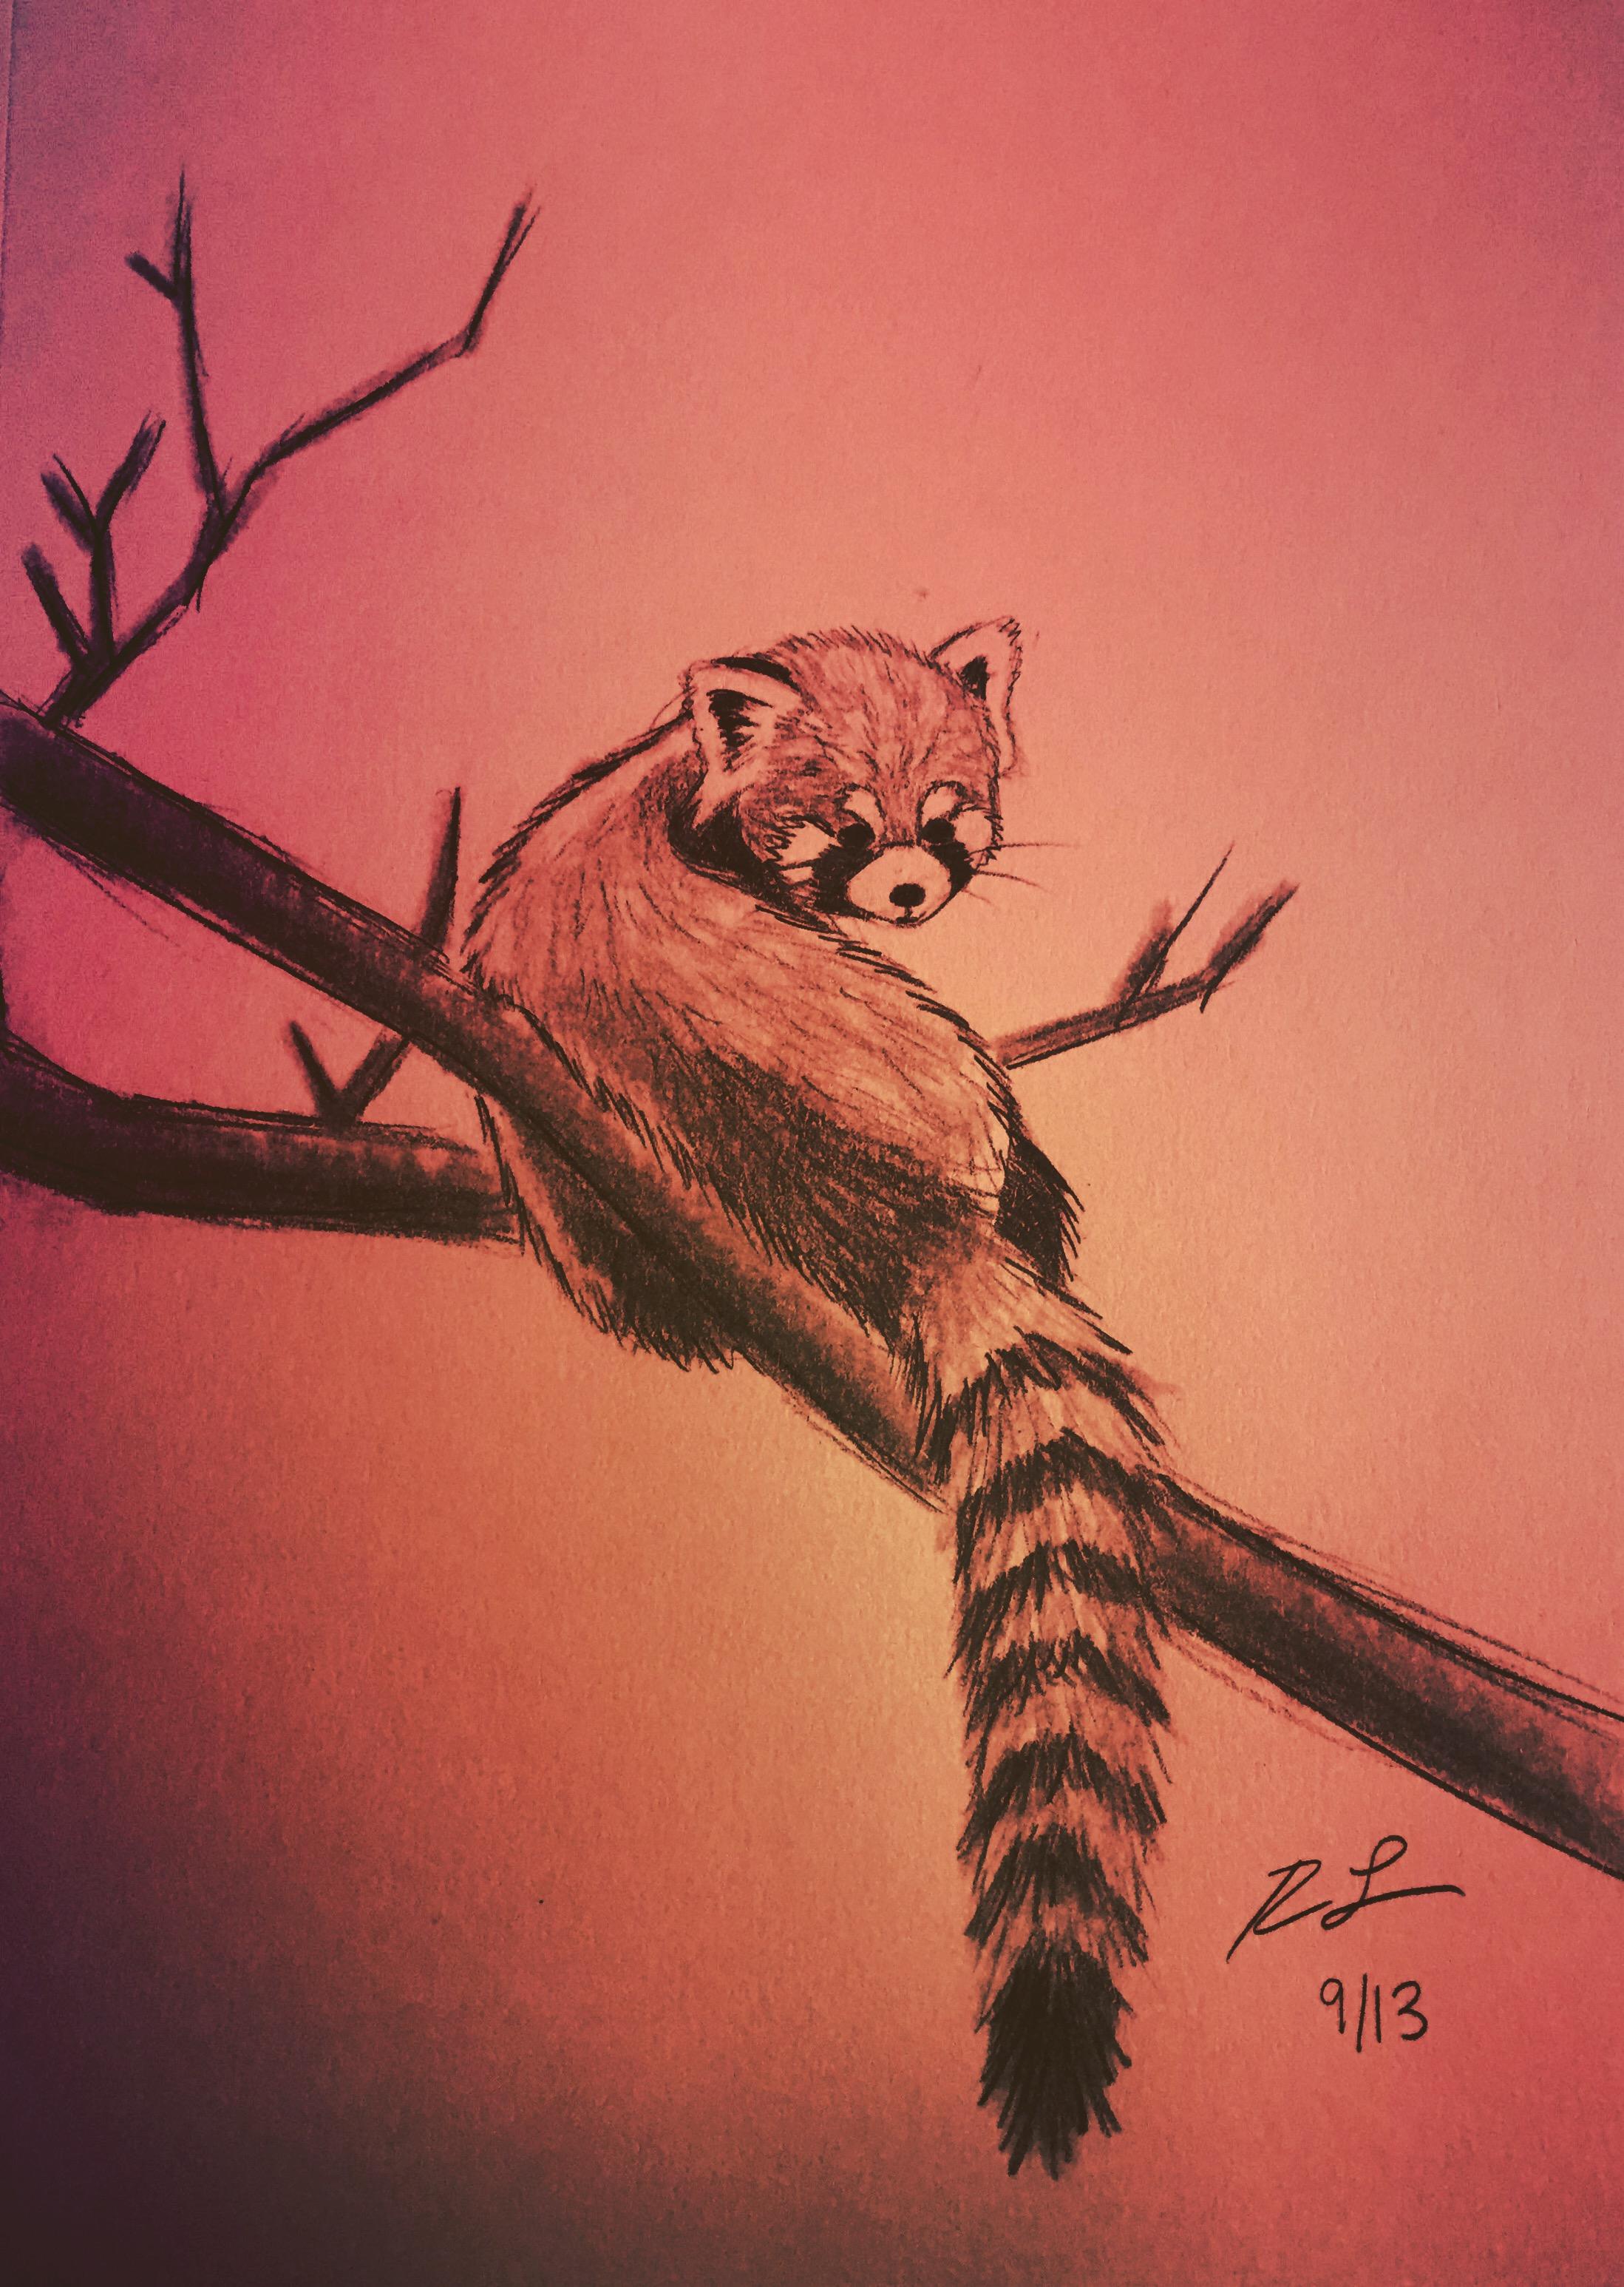 Drawn red panda epic Sketch Pinterest Panda Rhoda Red